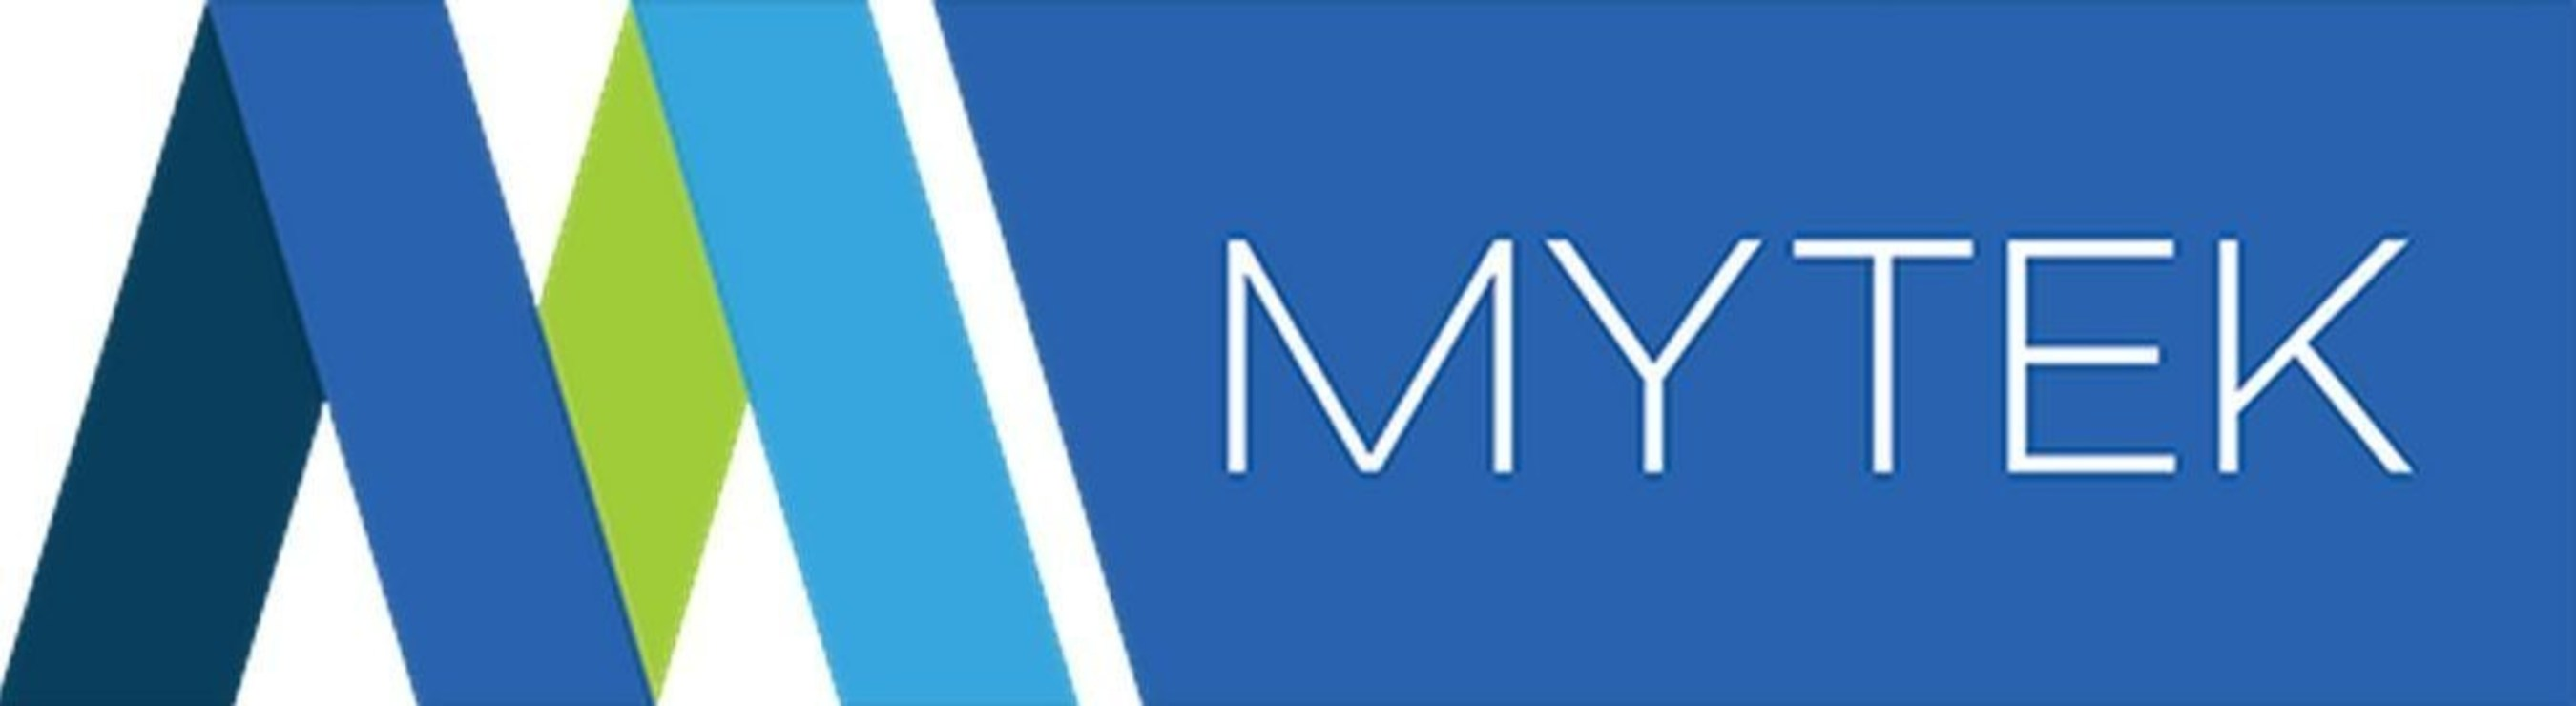 Mytek Announces Emergency Migration Services for Microsoft Windows' Server 2003 End-of-Life